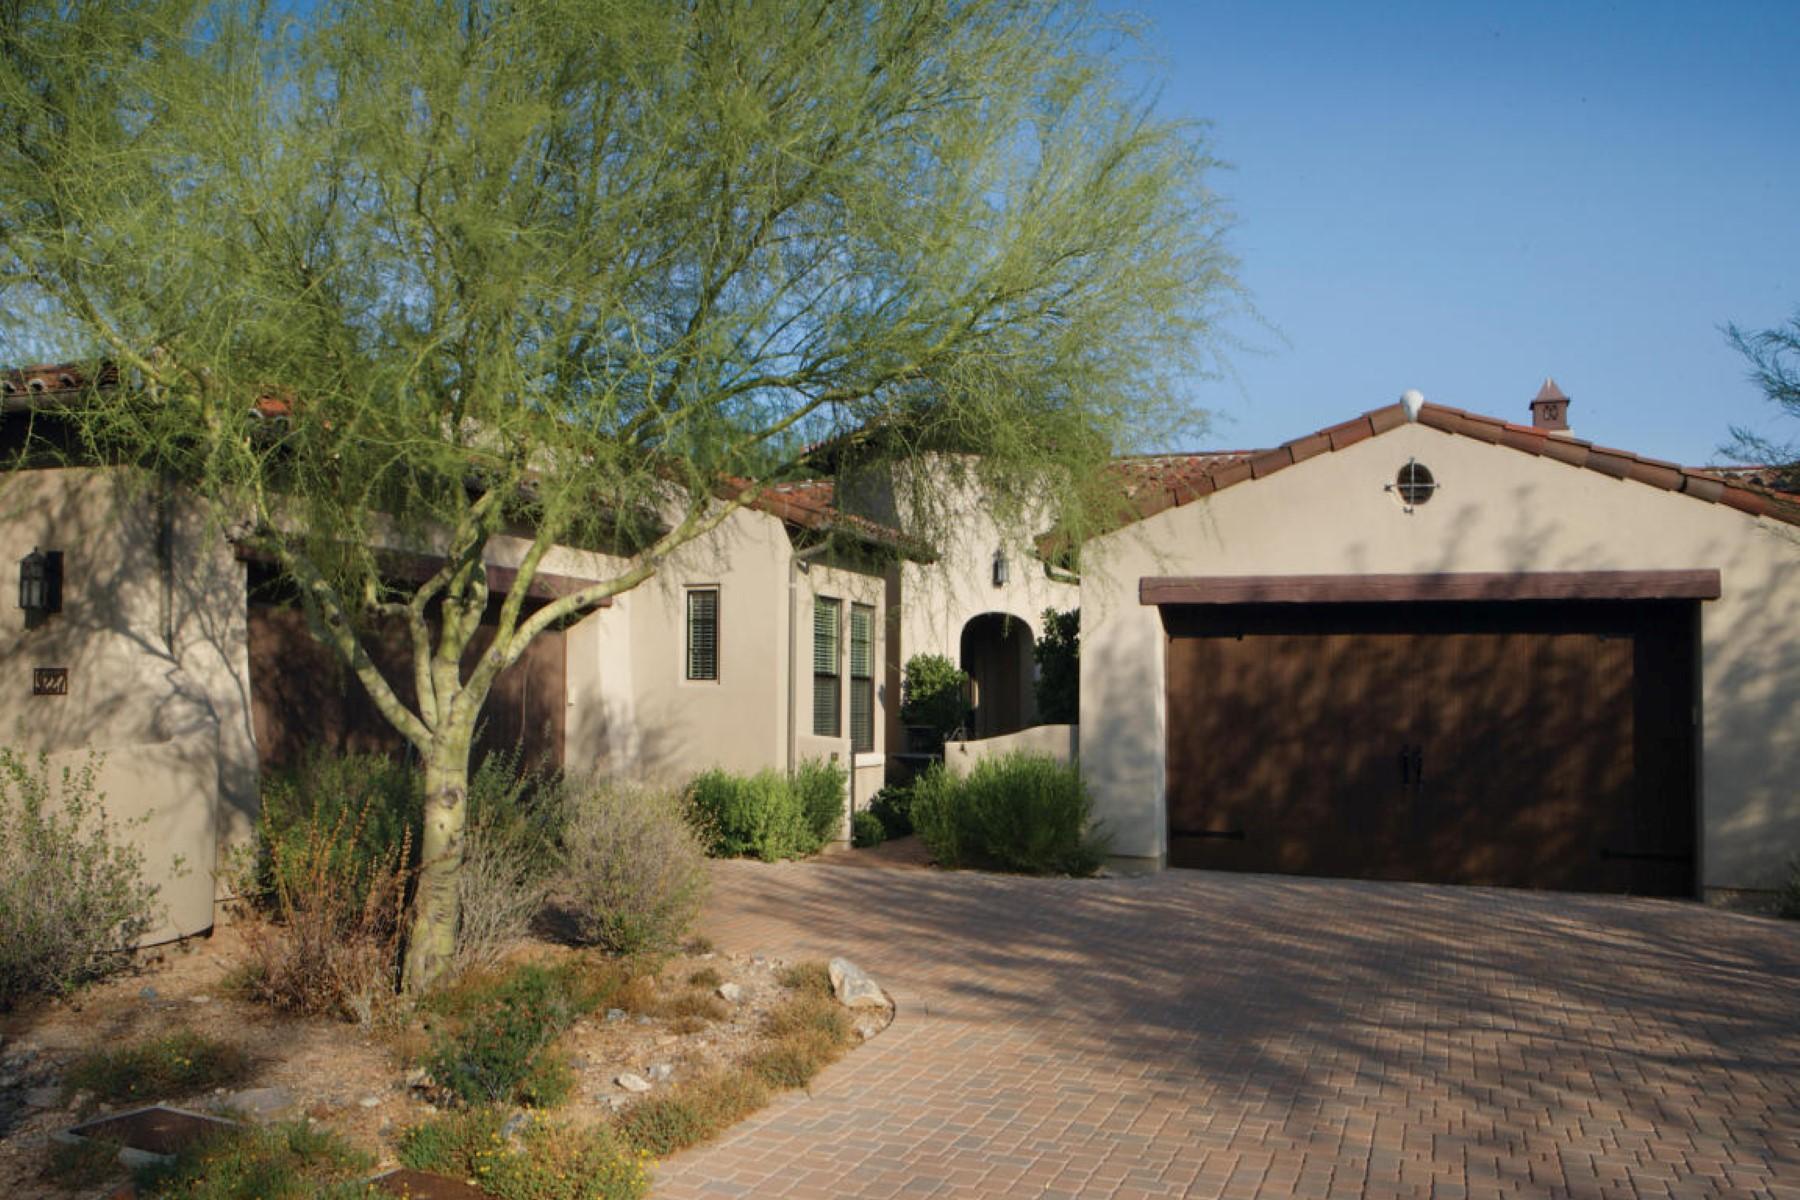 Таунхаус для того Продажа на Charming end unit townhouse in DC Ranch 9227 E Hoverland Rd Scottsdale, Аризона 85255 Соединенные Штаты